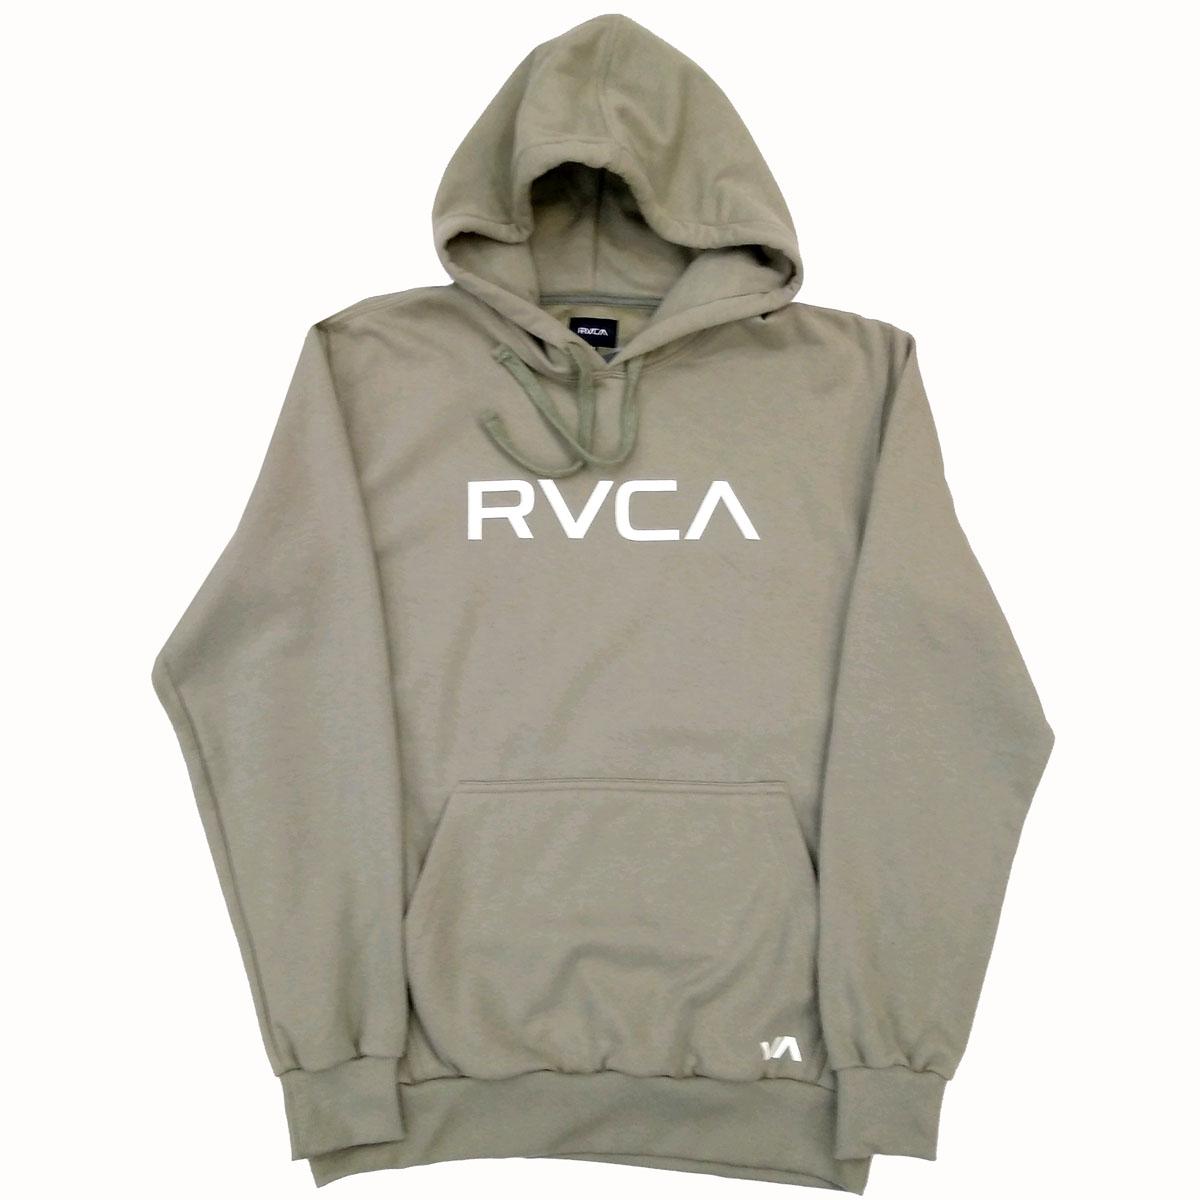 Moletom RVCA Big Rvca